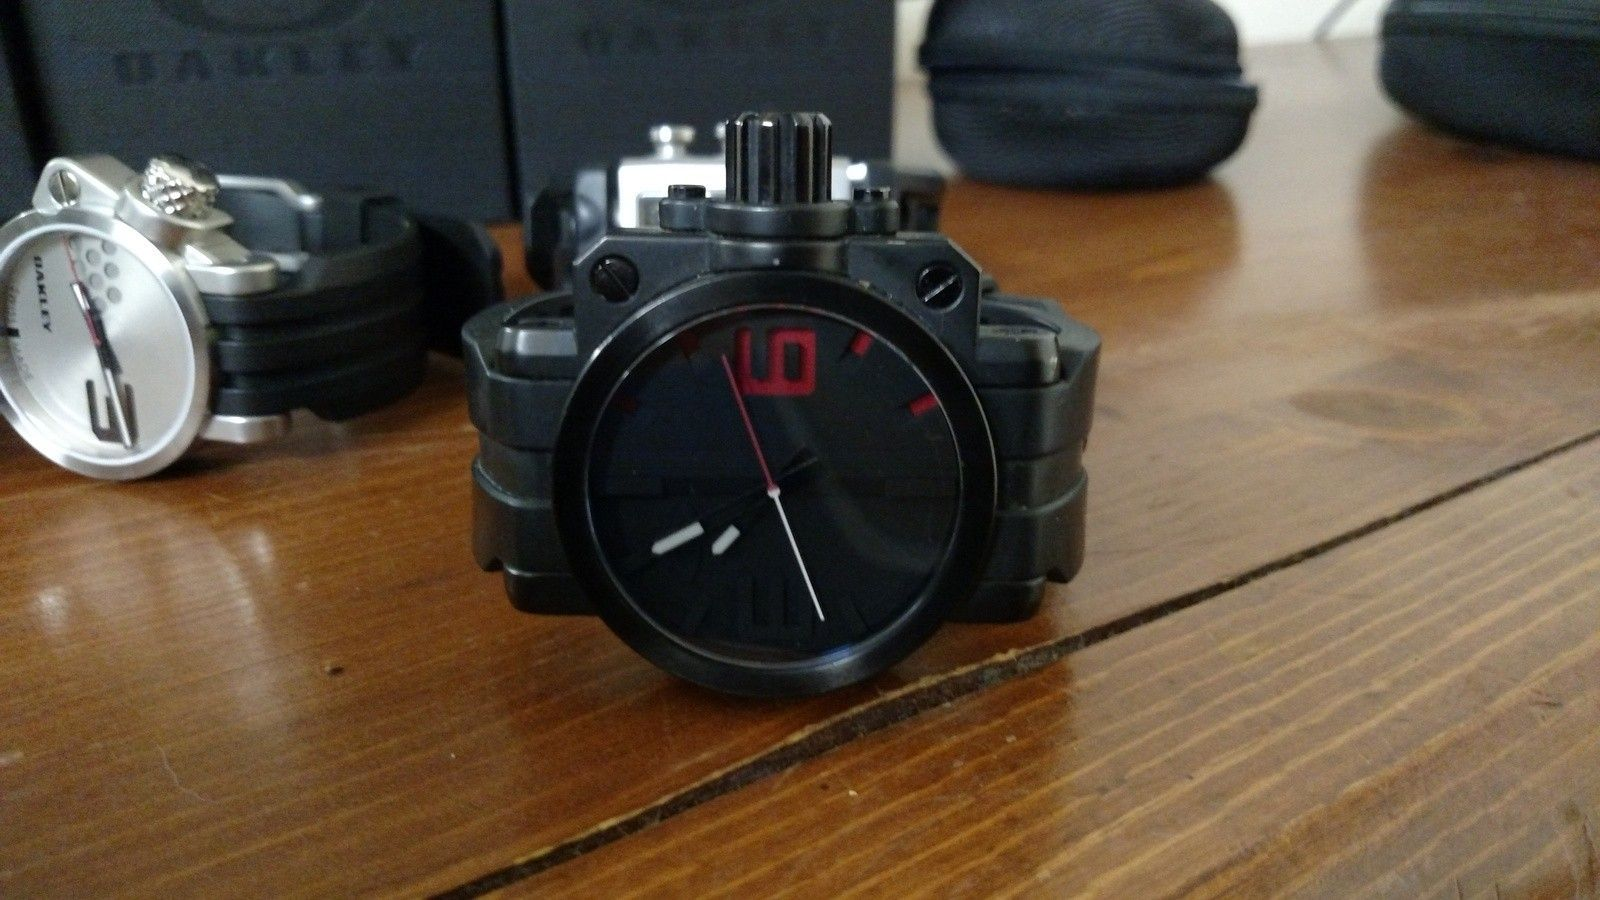 Lot of watches (cheap) - uploadfromtaptalk1446852058846.jpg